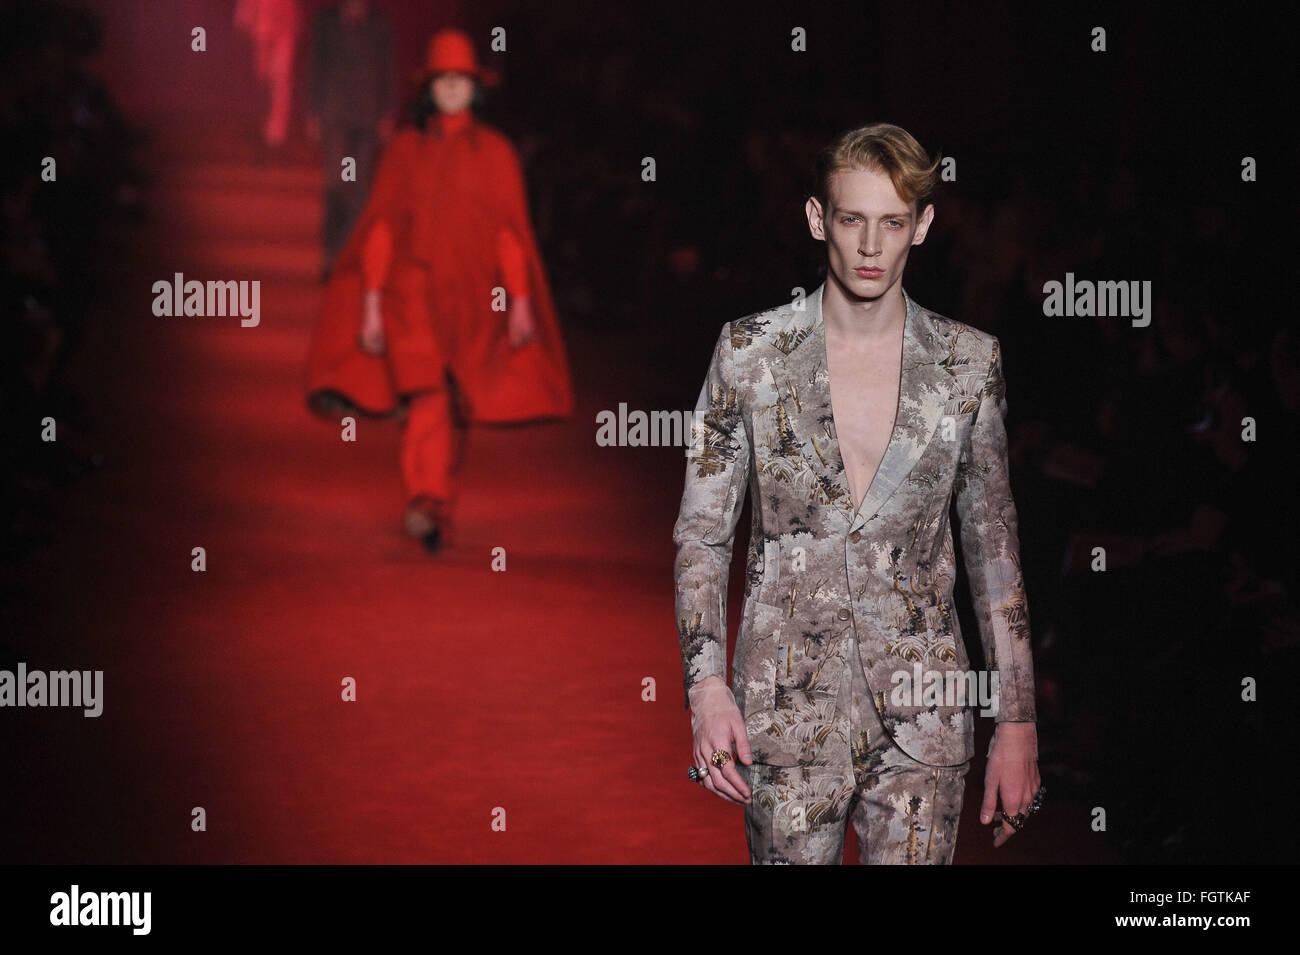 6177312e7 Milan Fashion Week Men F/W 2016 - Gucci - Catwalk Featuring: Hari Nef